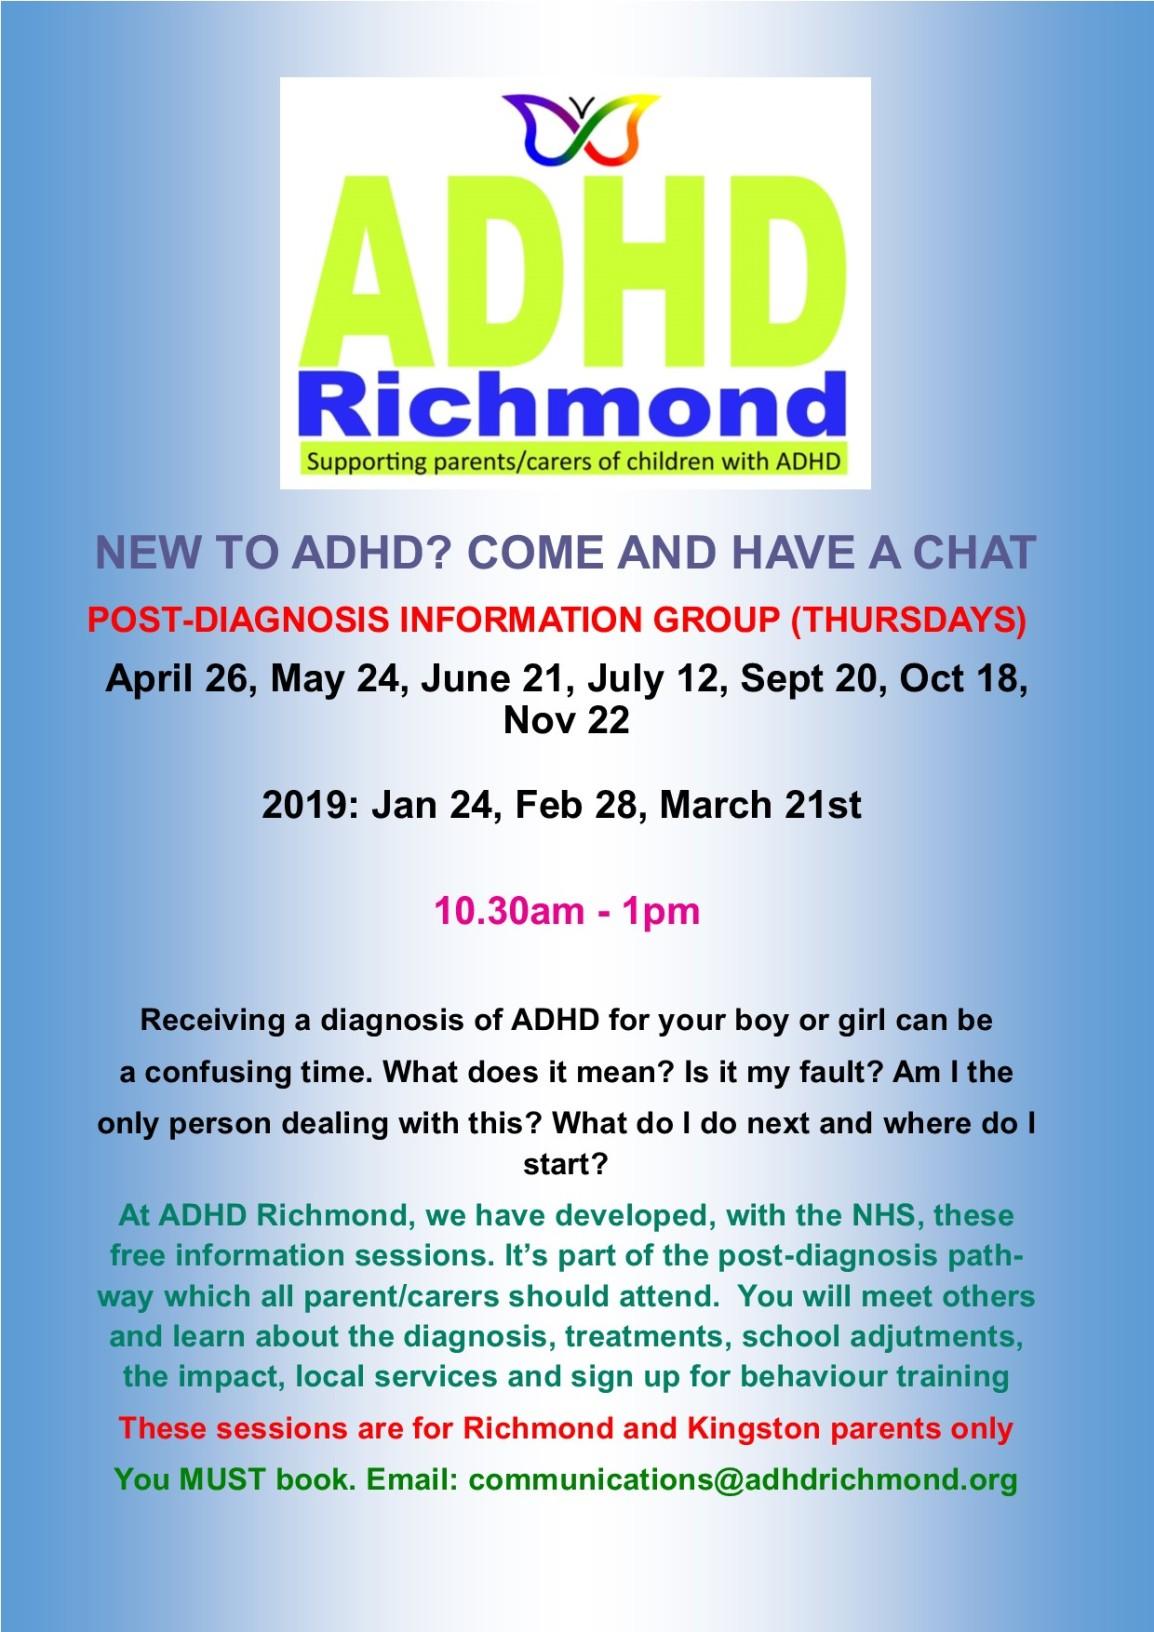 #ADHD post-diagnosis Apr 26. Thx @KingstonCCG@NHSRichmondCCG